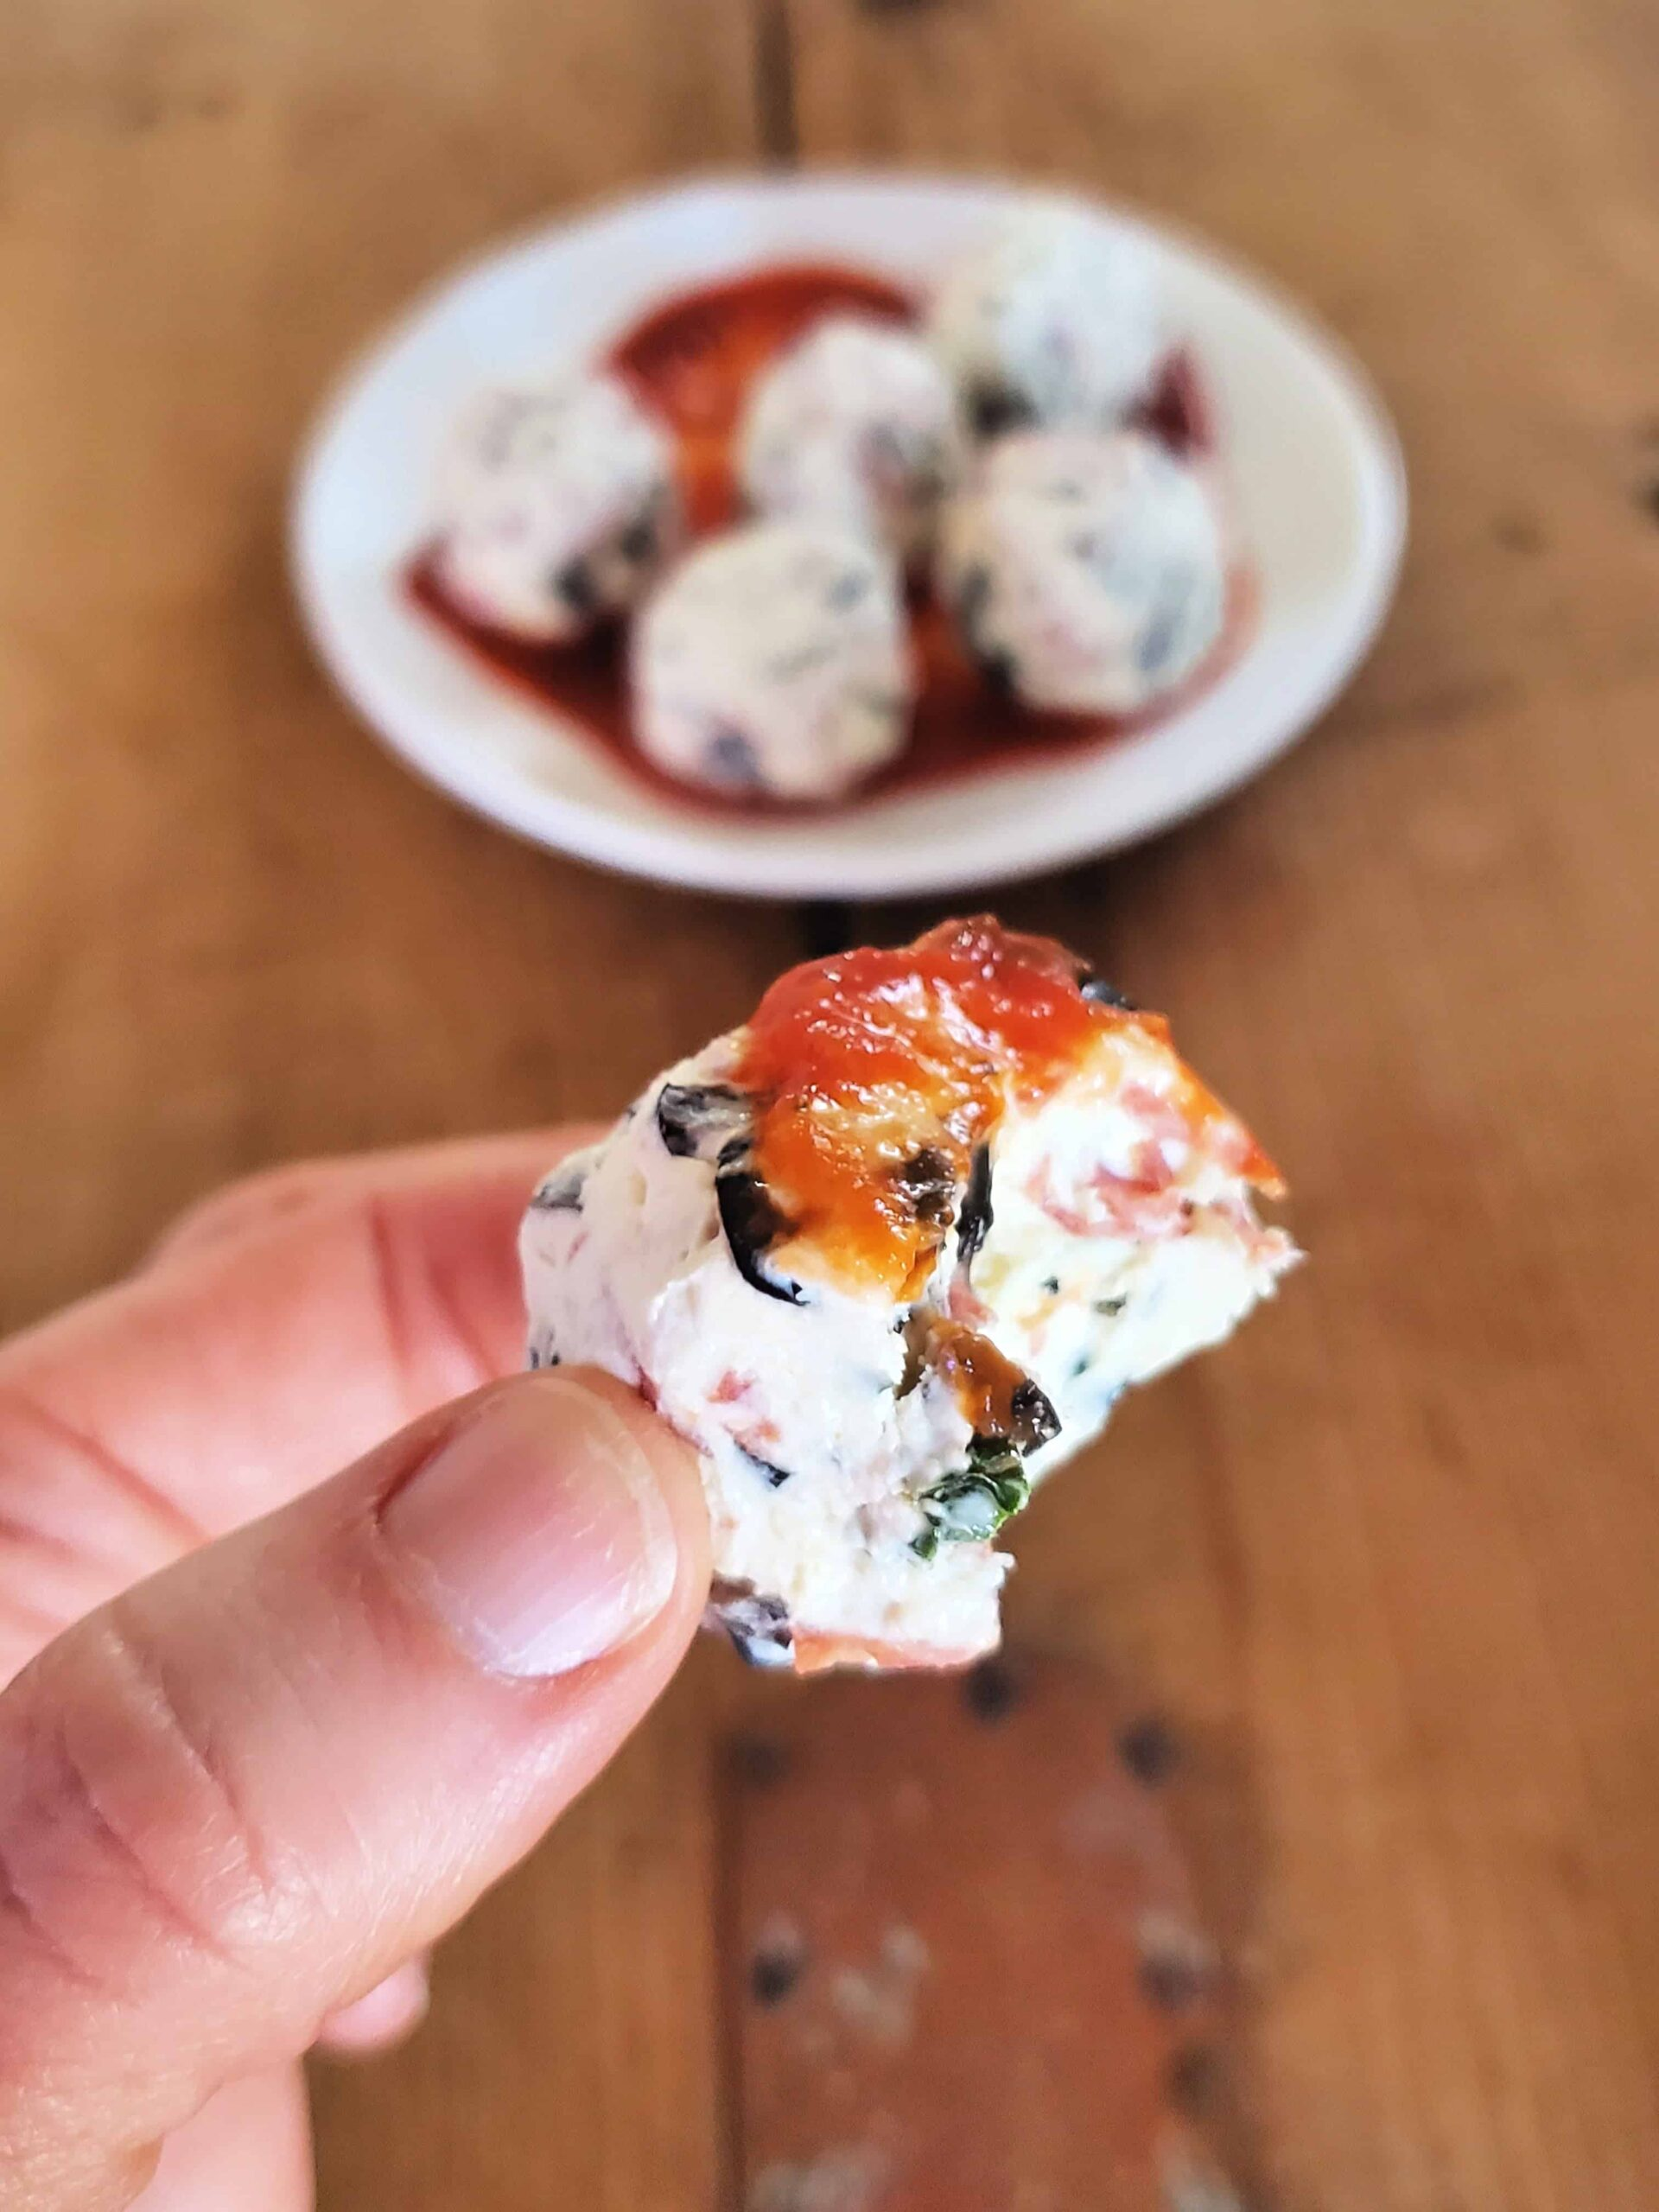 pizza fat bite with marinara sauce